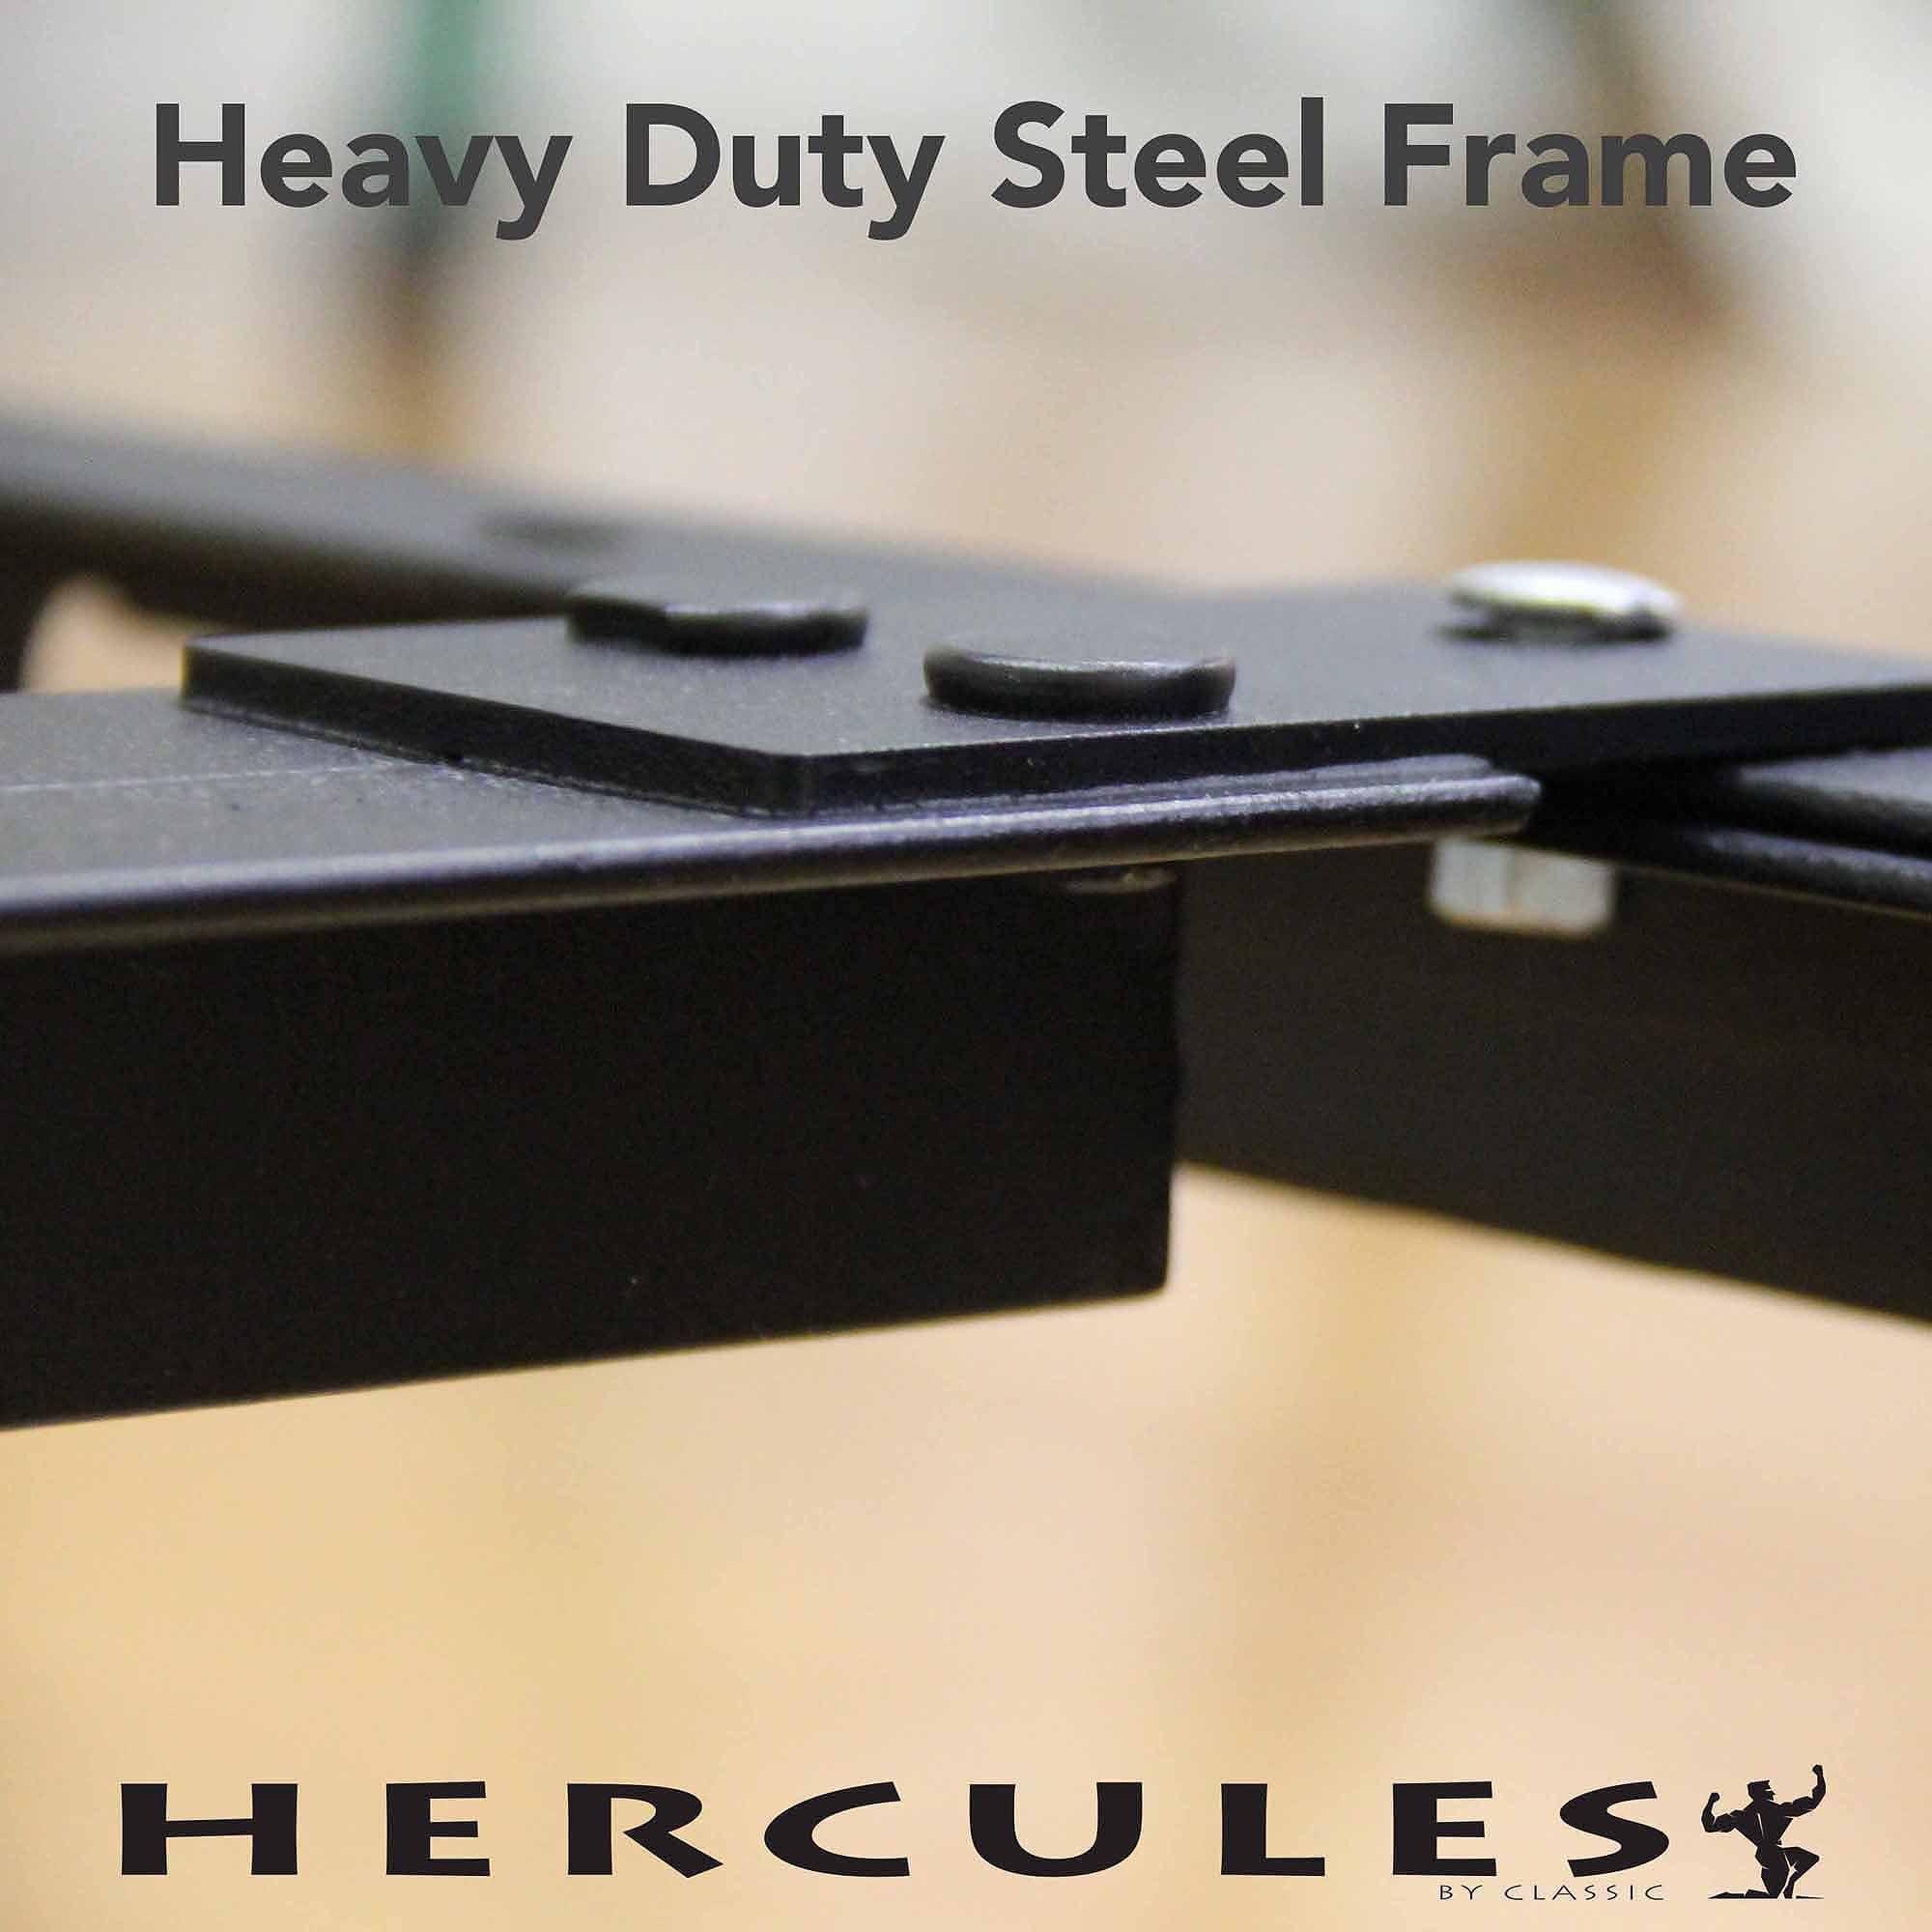 Modern Sleep Adjustable Metal Bed Frame Double Rail Center